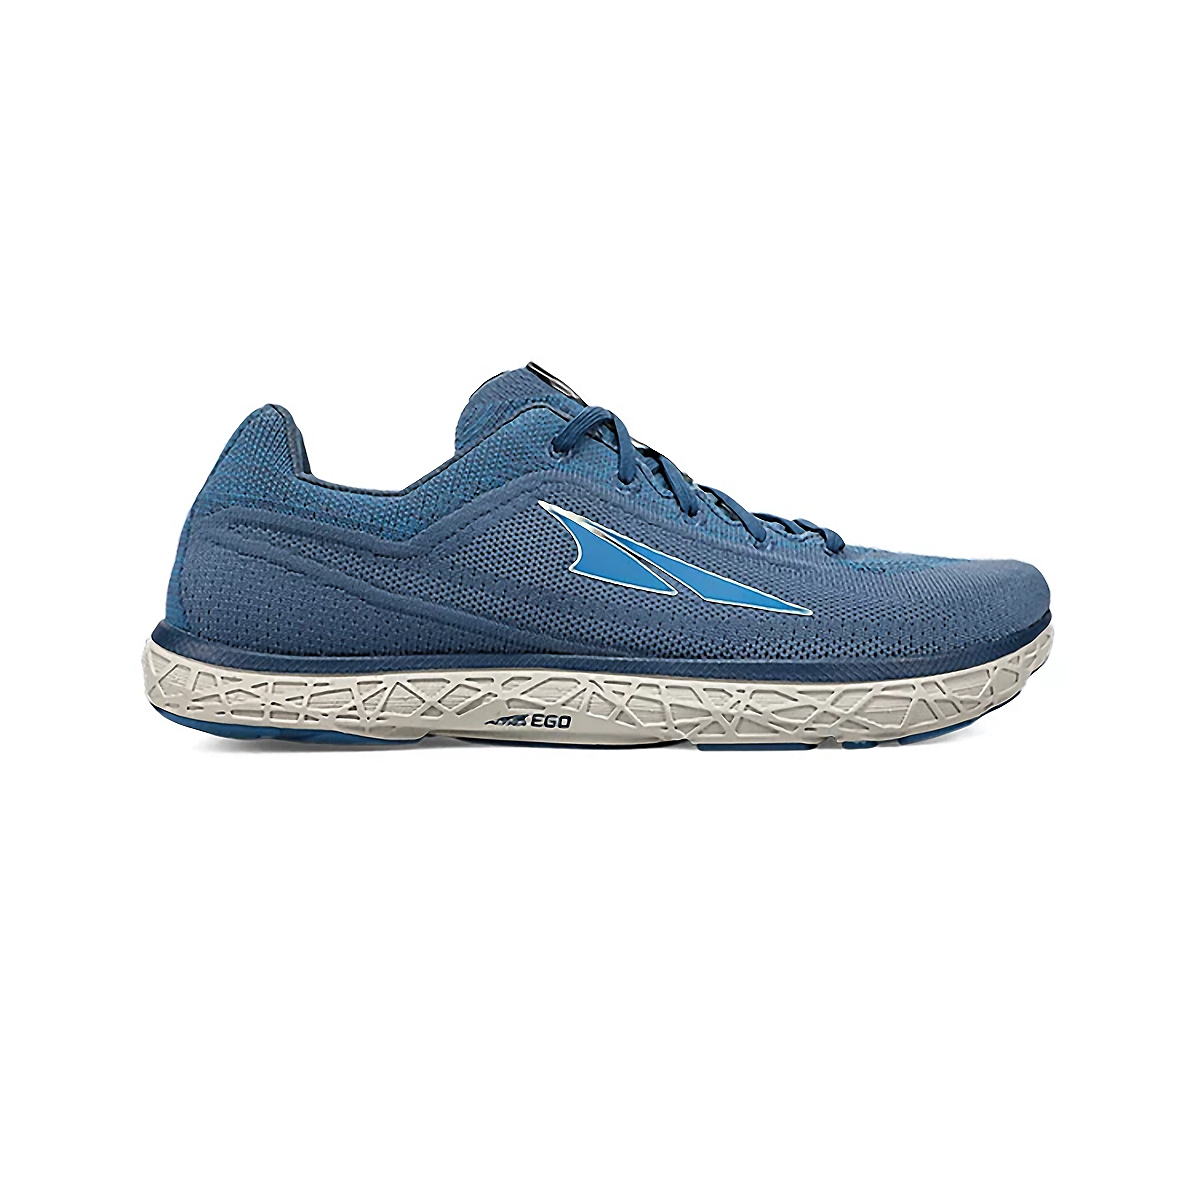 Men's Altra Escalante 2.5 Running Shoe - Color: Majolica Blue - Size: 7 - Width: Regular, Majolica Blue, large, image 1